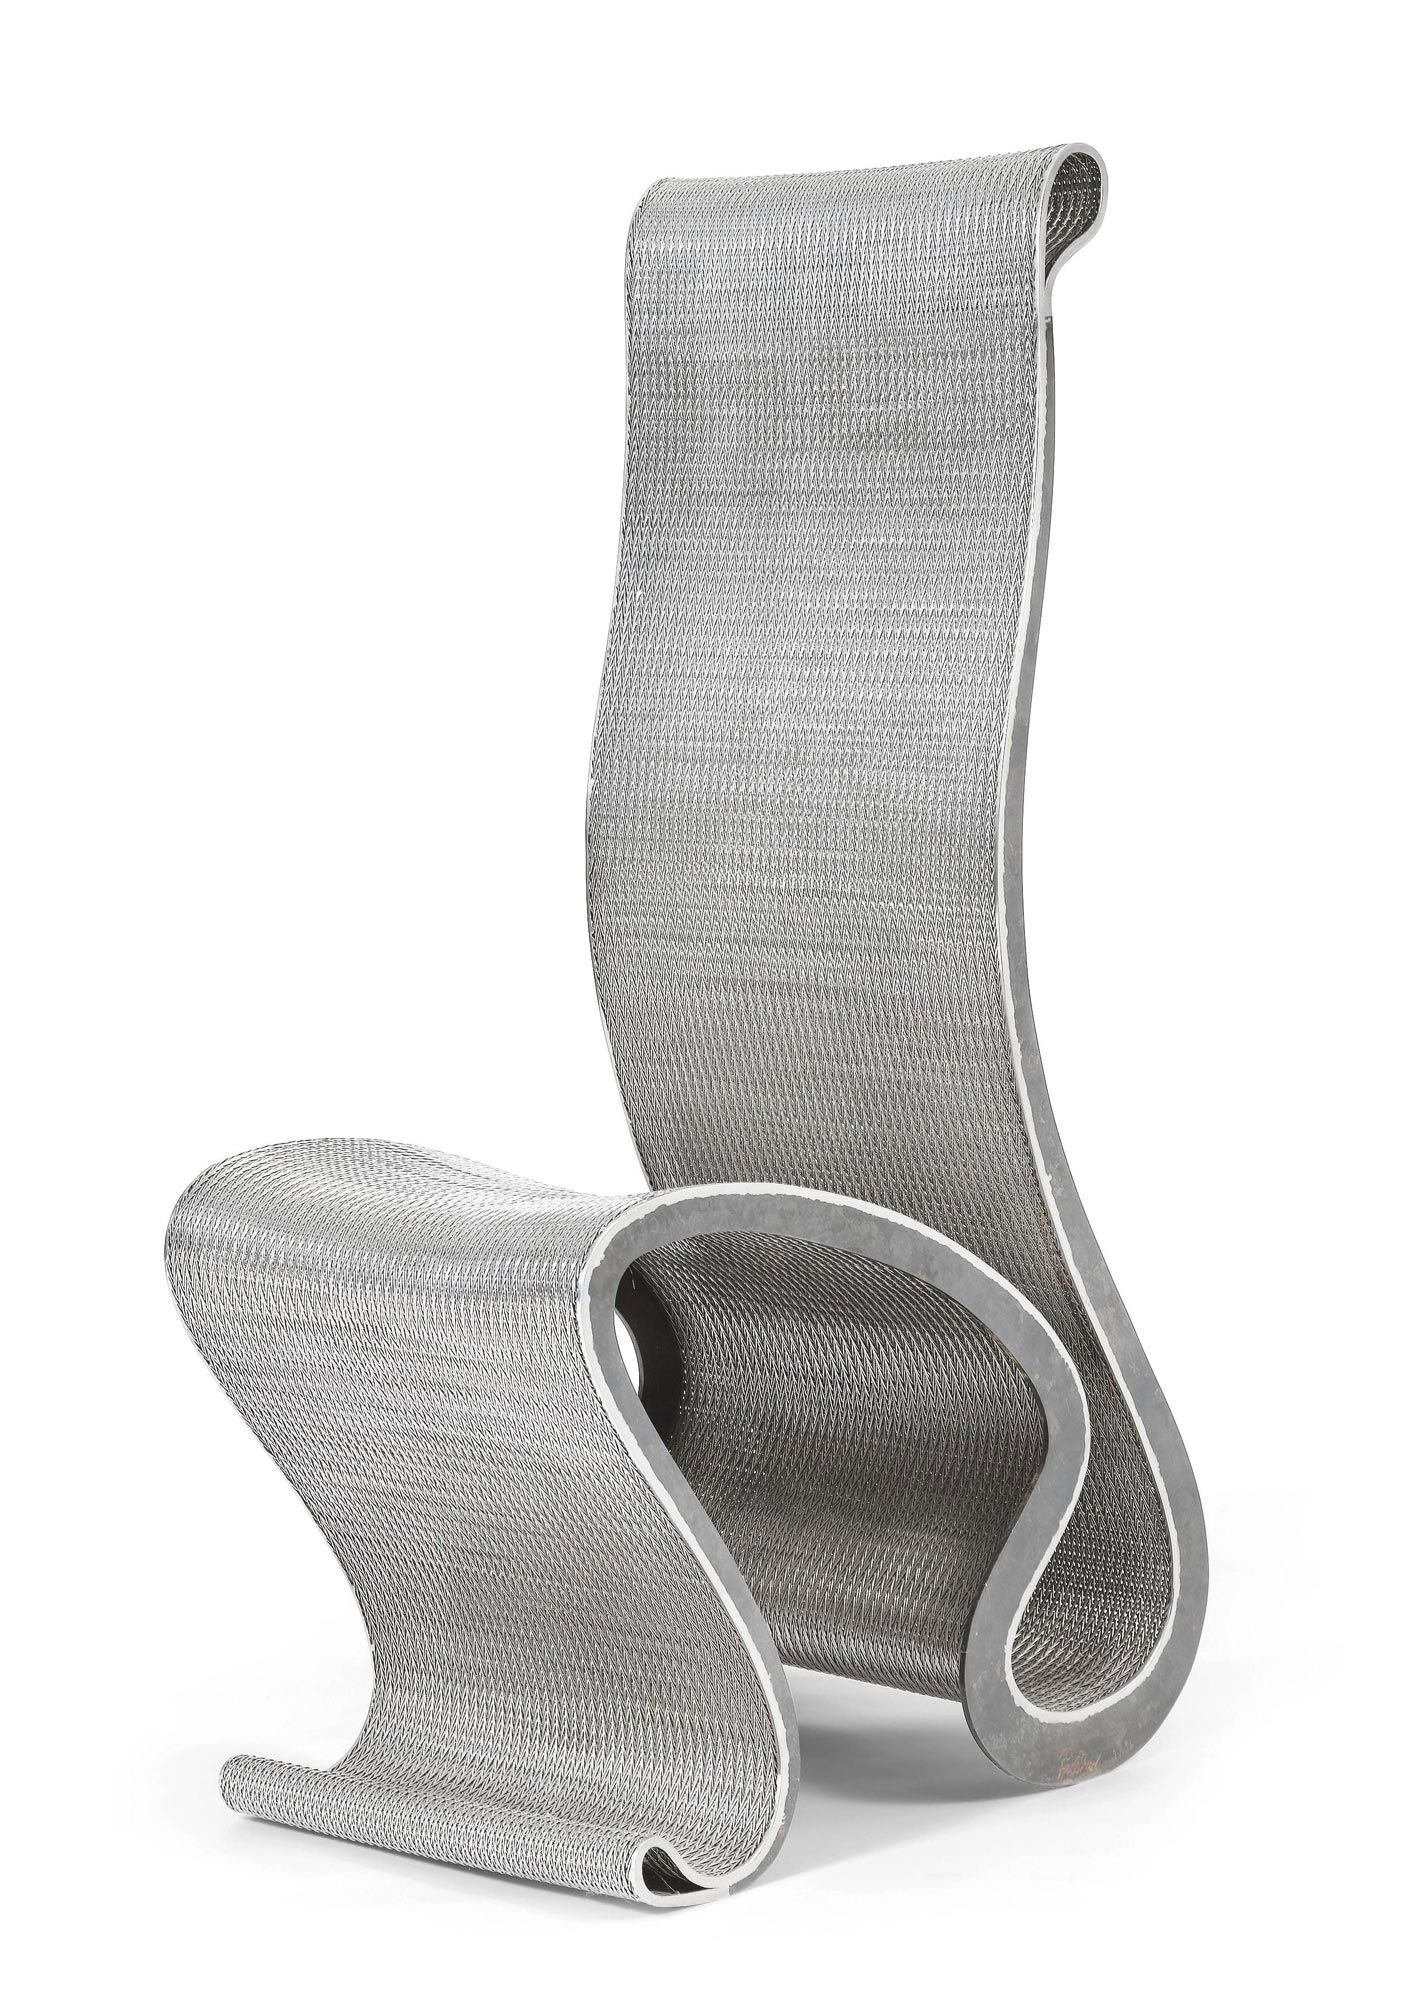 ron arad chaise loop loop ron arad pinterest assises mobilier et chaises. Black Bedroom Furniture Sets. Home Design Ideas